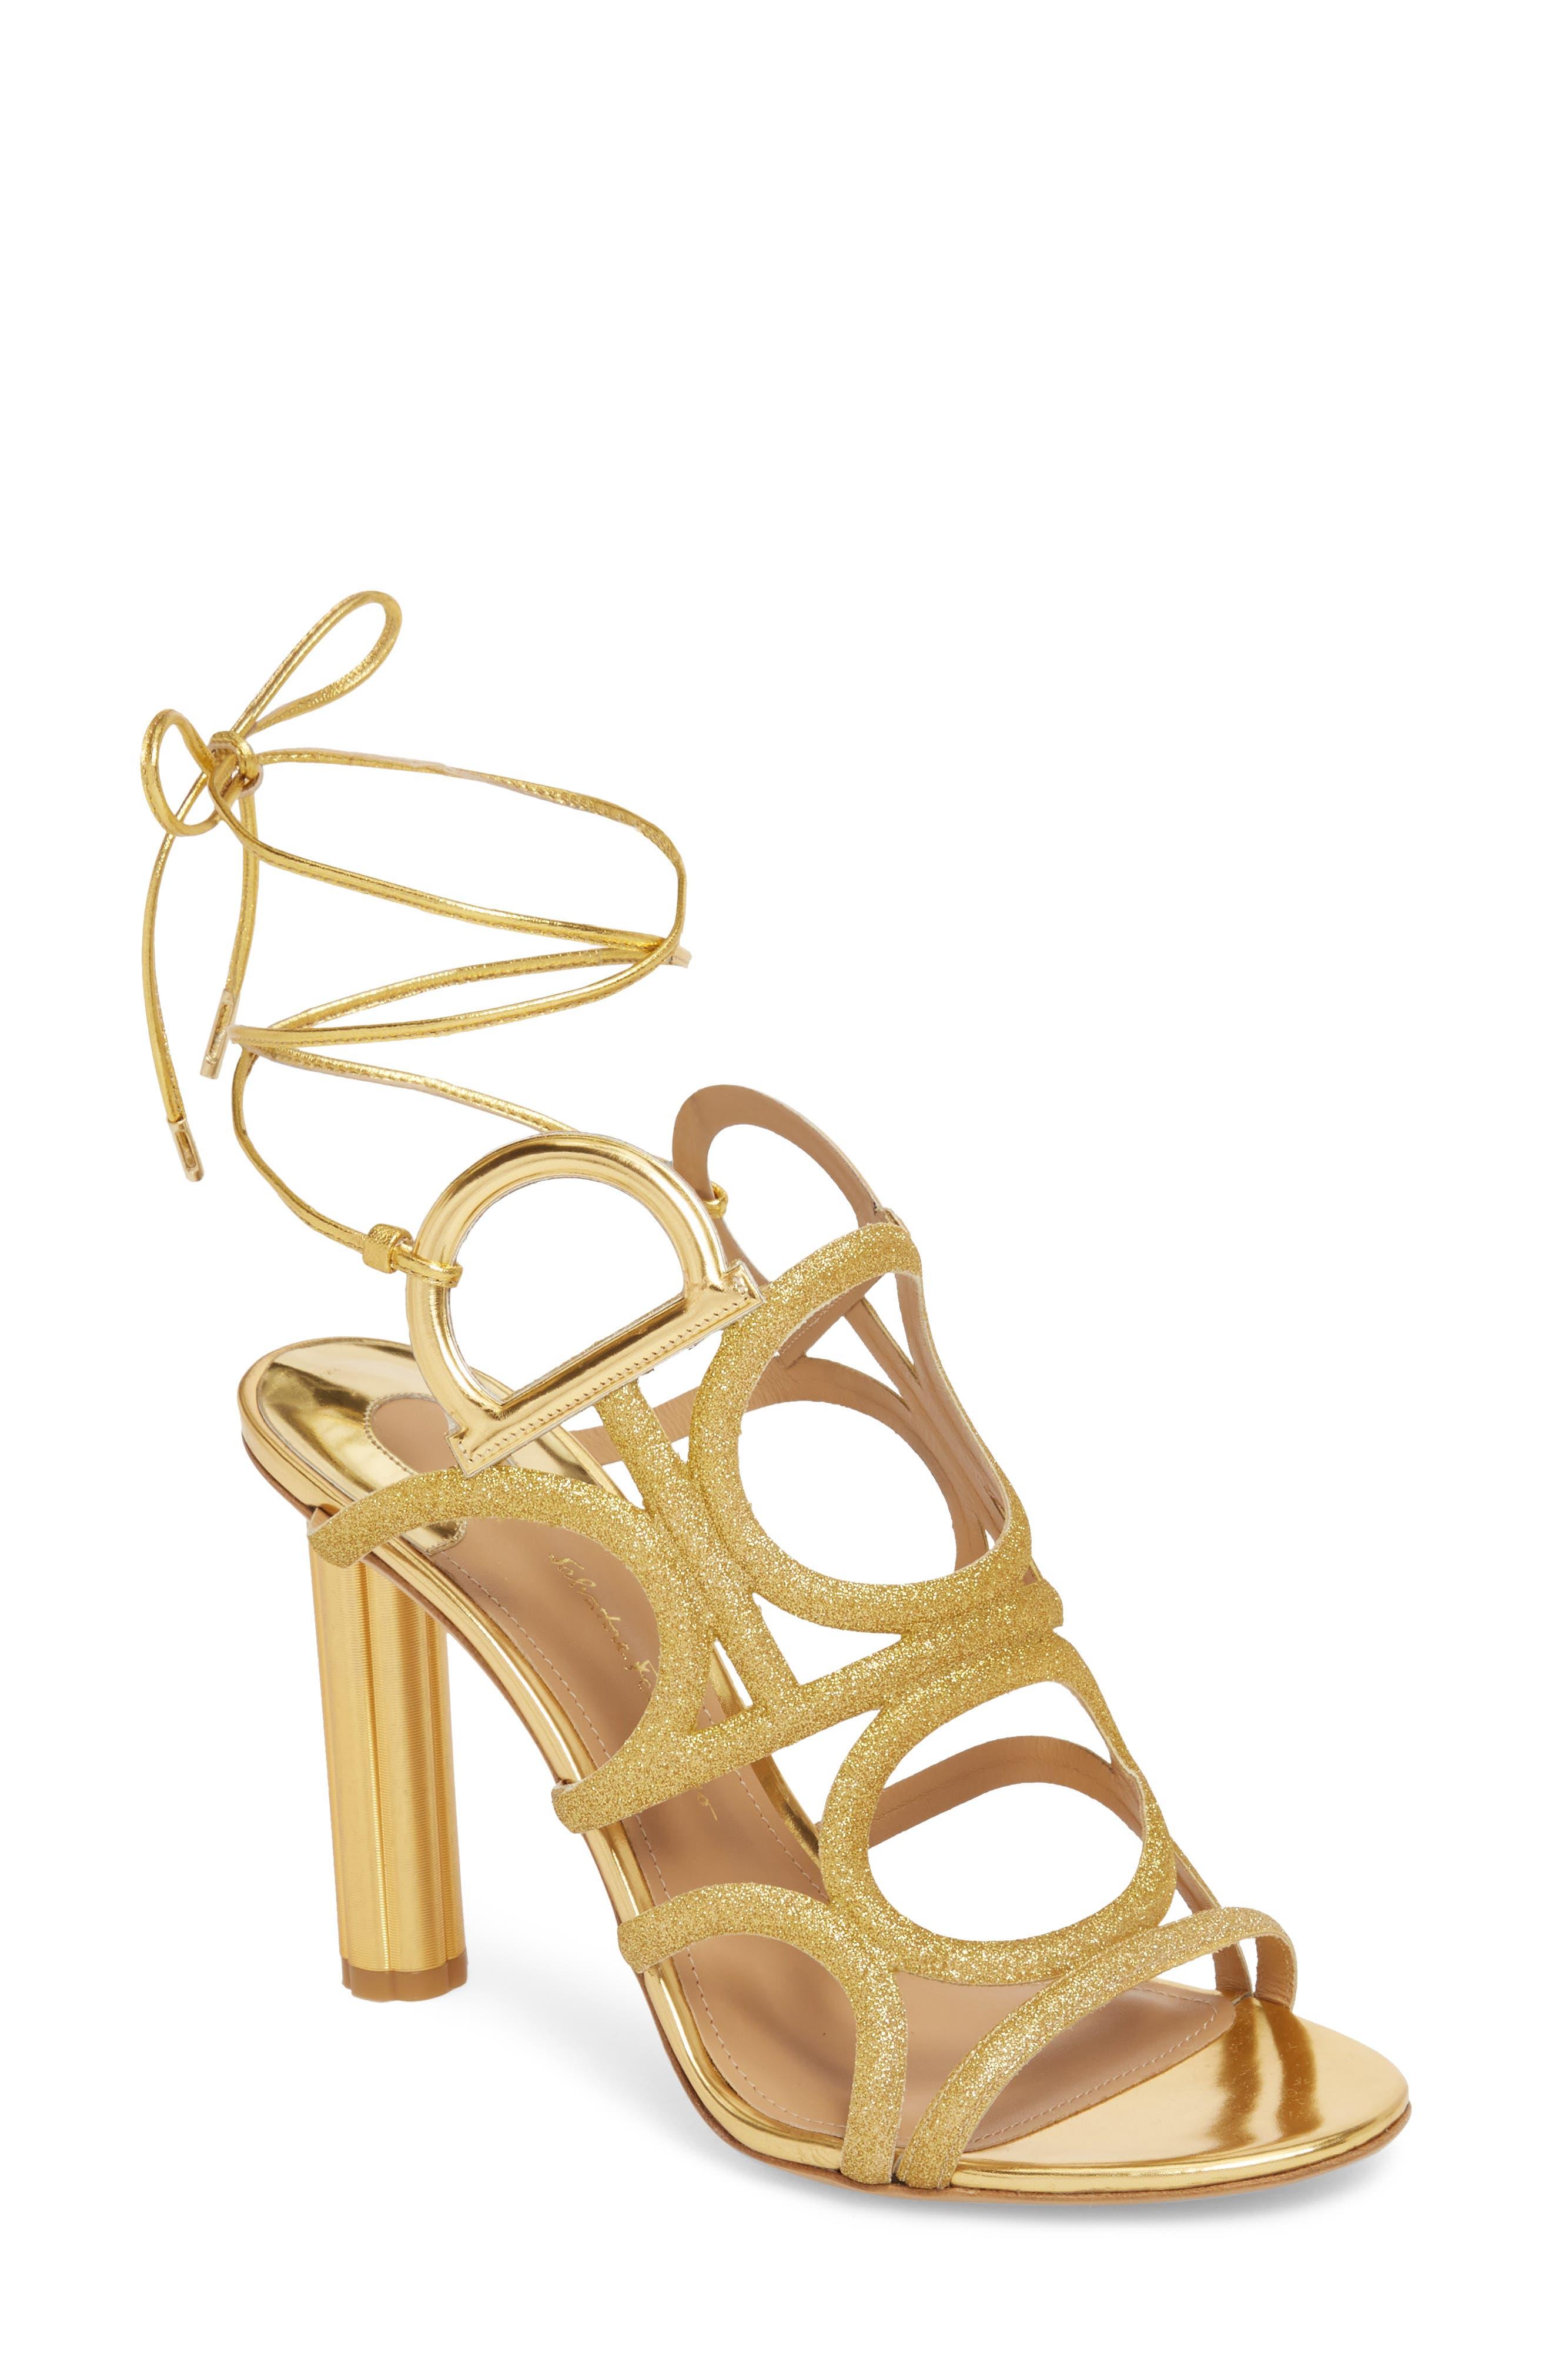 Vinci Lace-Up Heeled Sandal,                         Main,                         color, 710